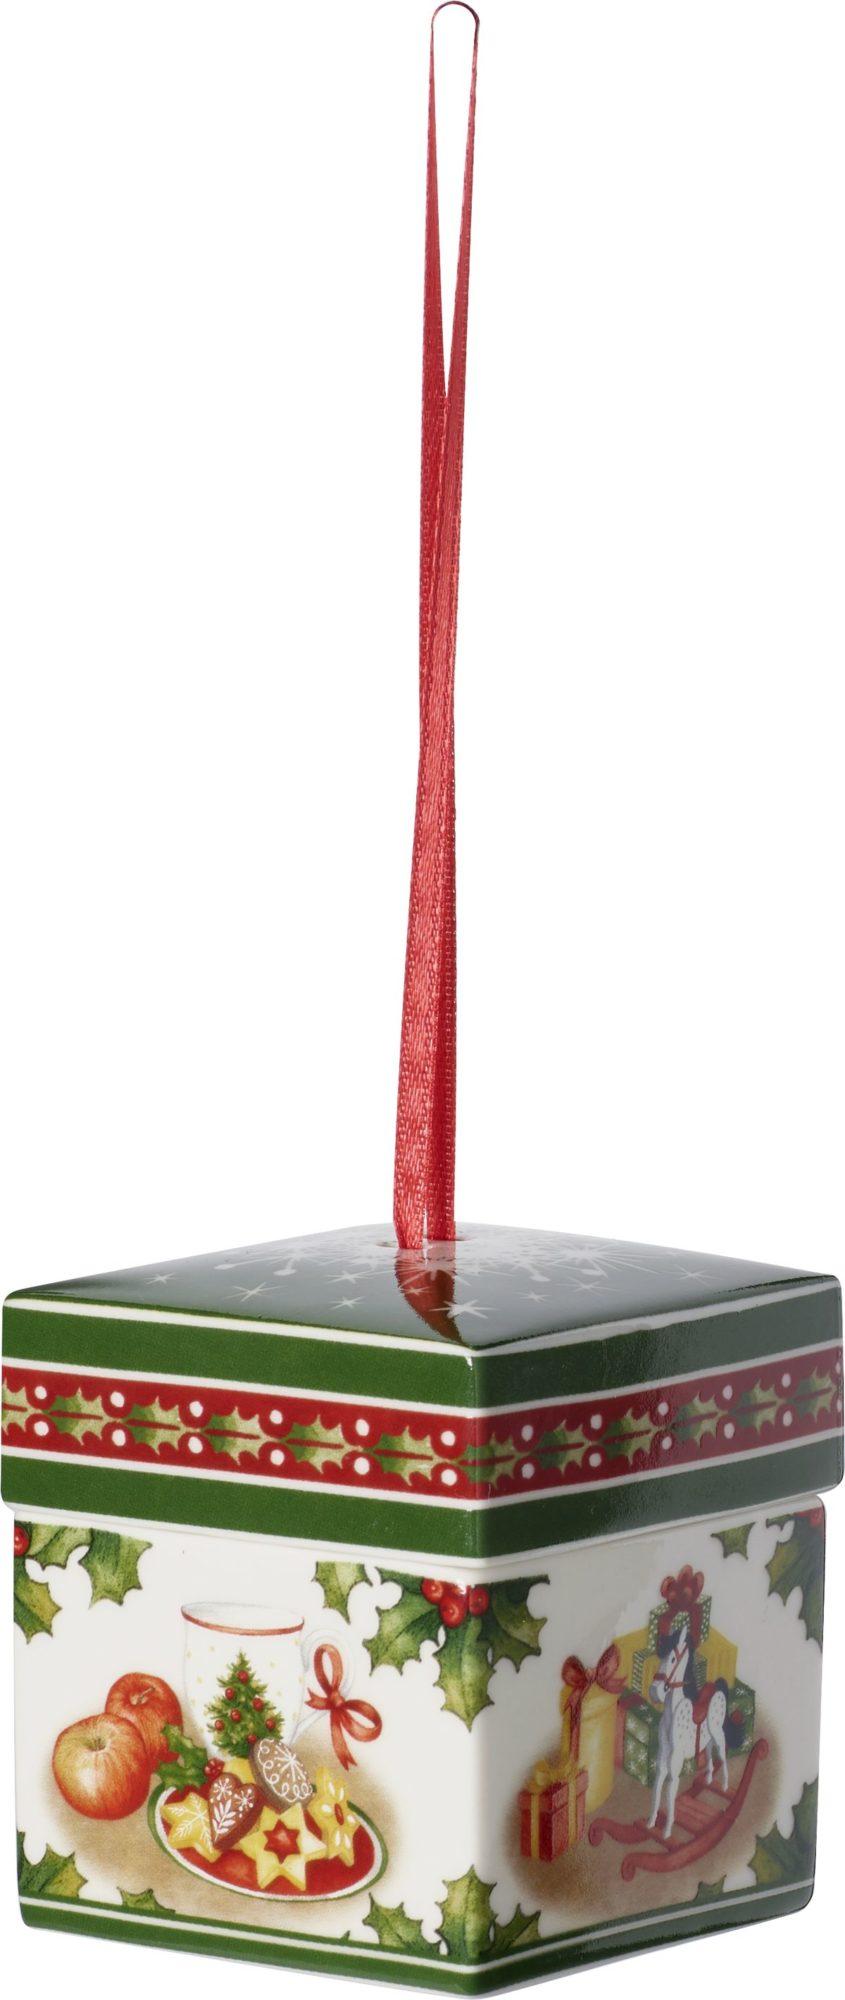 luxurytable.cz_my-christmas-tree-ozdoba-darkova-ctvercova-krabicka-villeroy-amp-boch-cena-620-kc.jpg